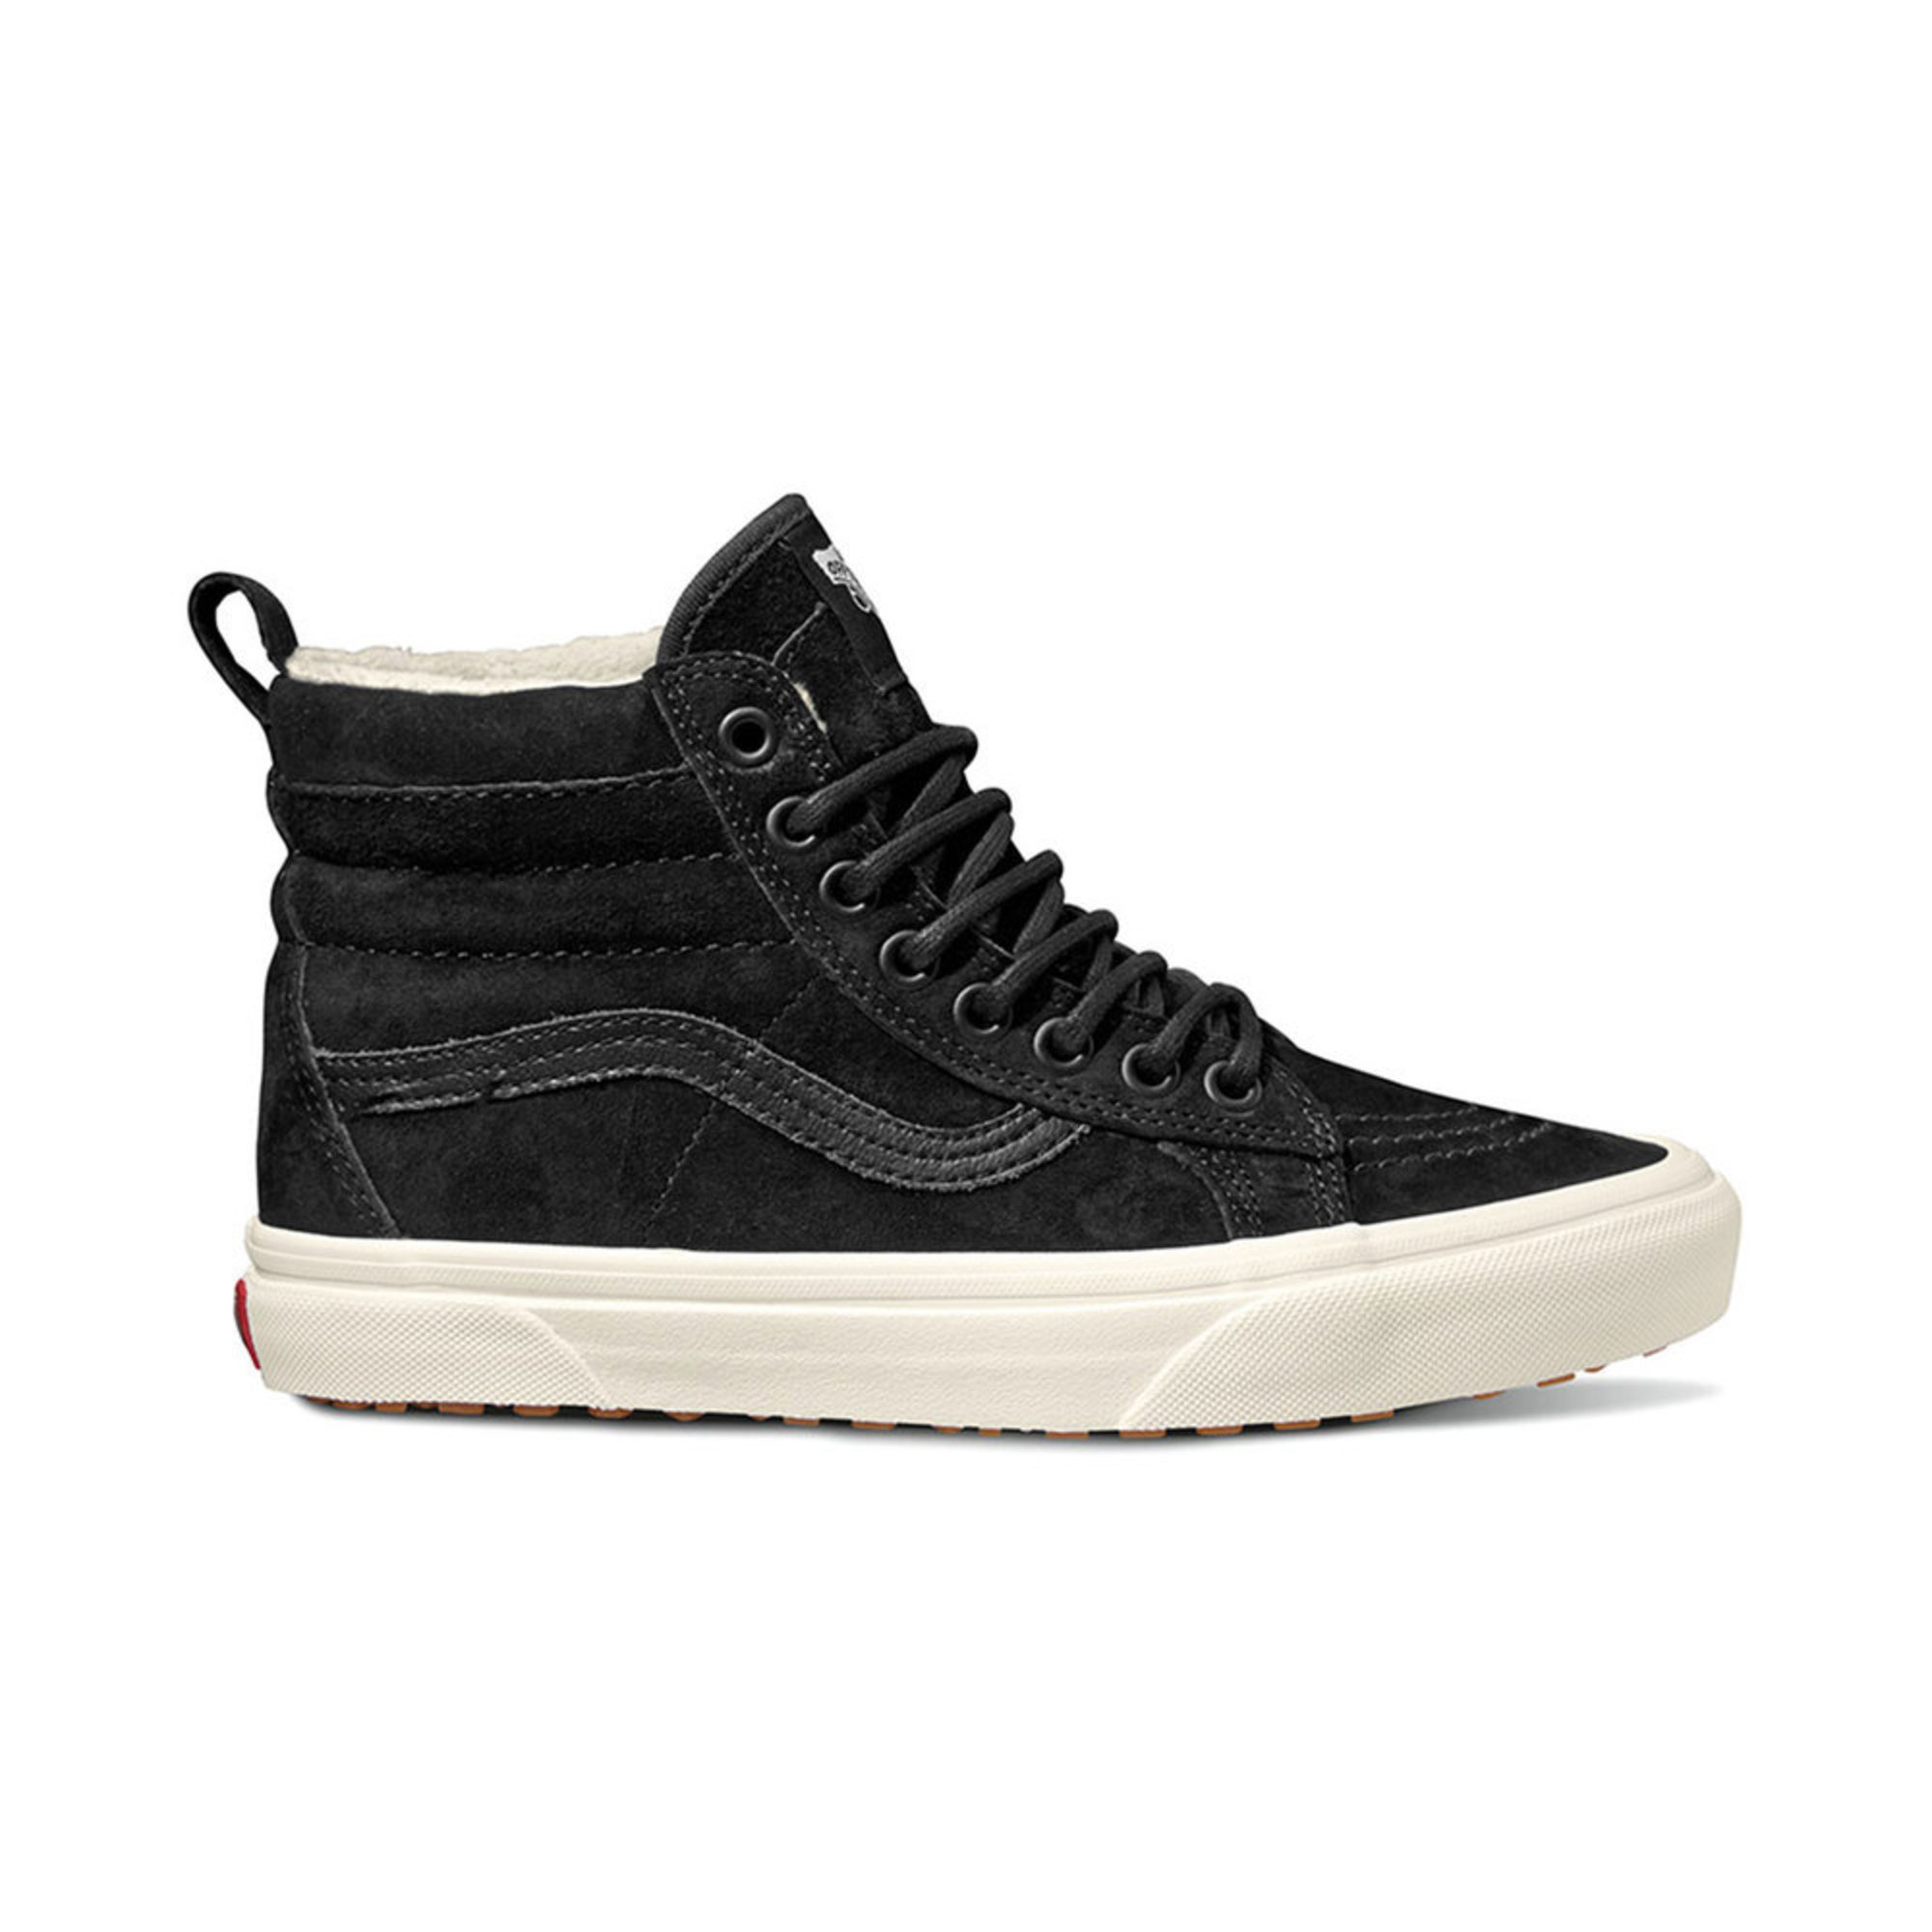 38c7a9c110 Vans. Vans Unisex SK8-Hi MTE Skate Shoe